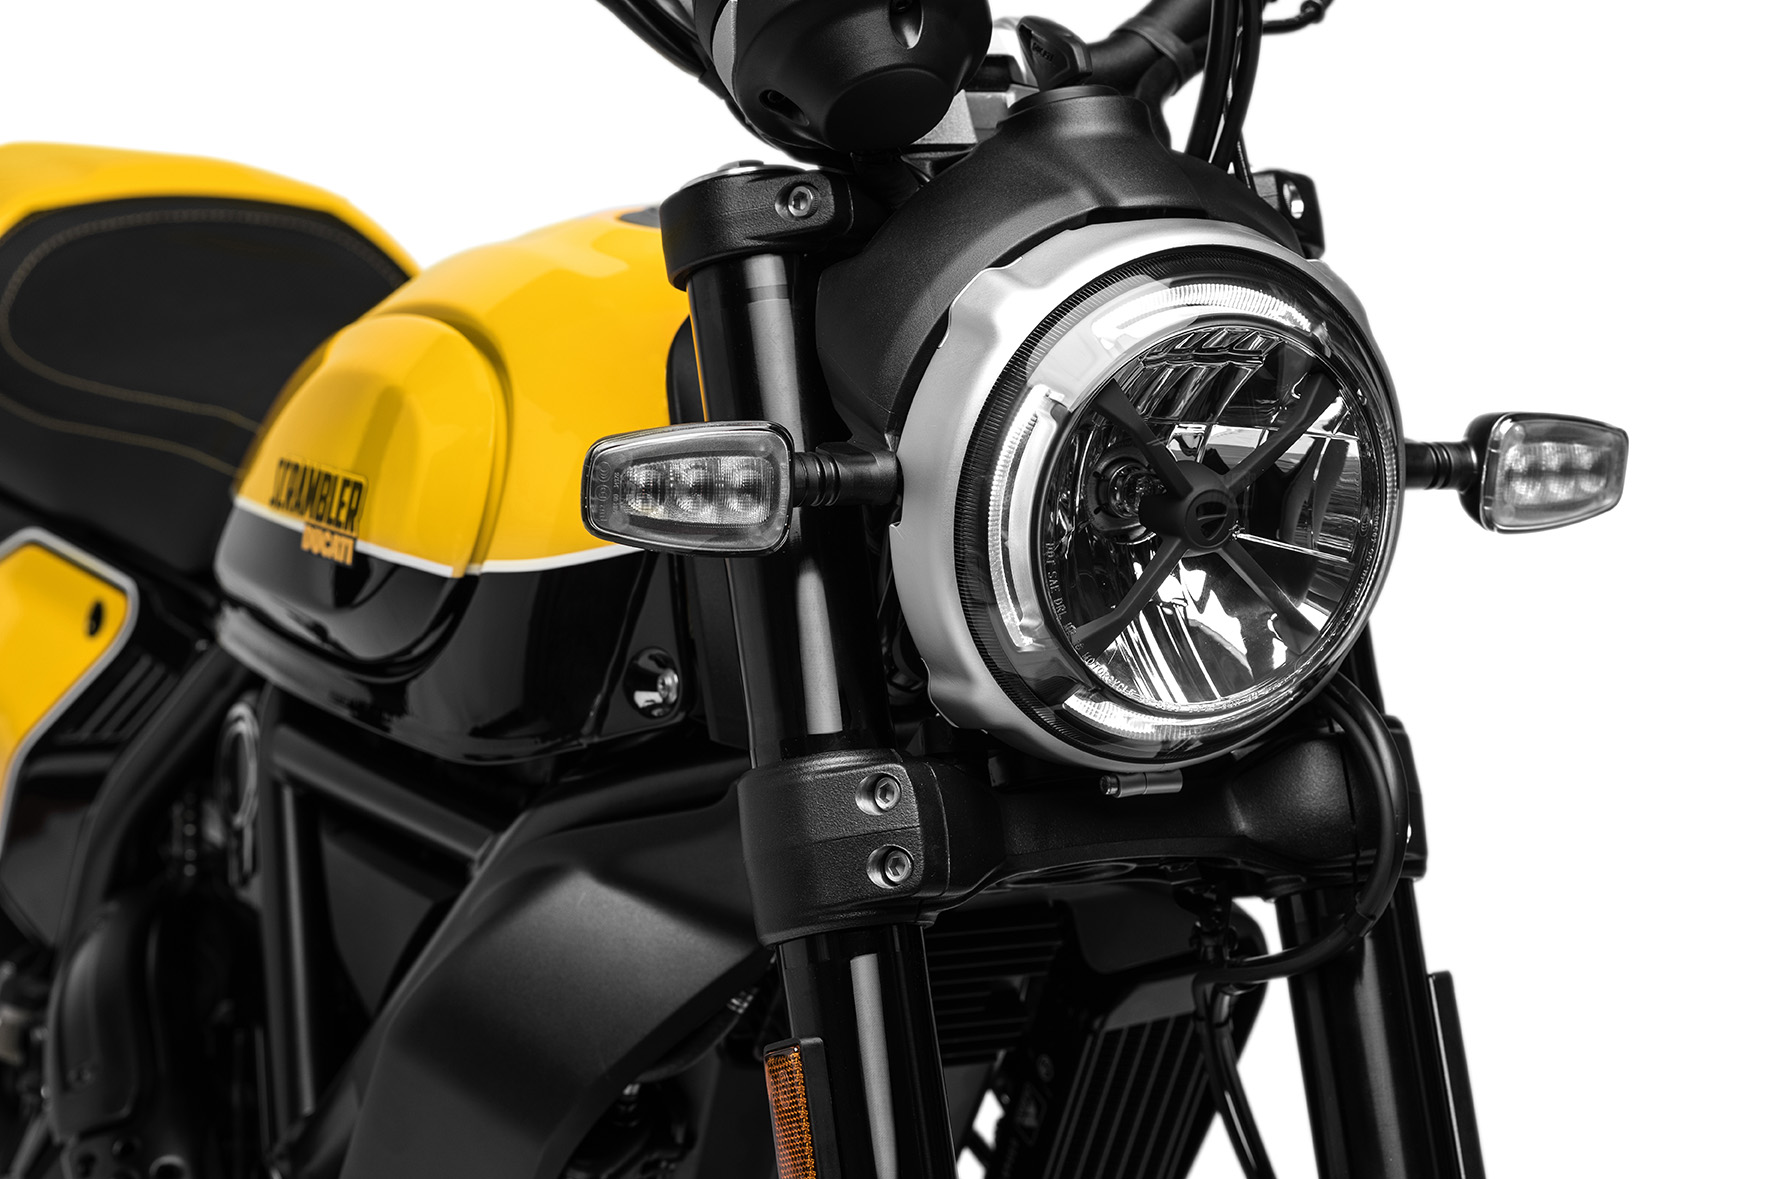 SCRAMBLER-FULL-THROTTLE-Ducati-Nice-5